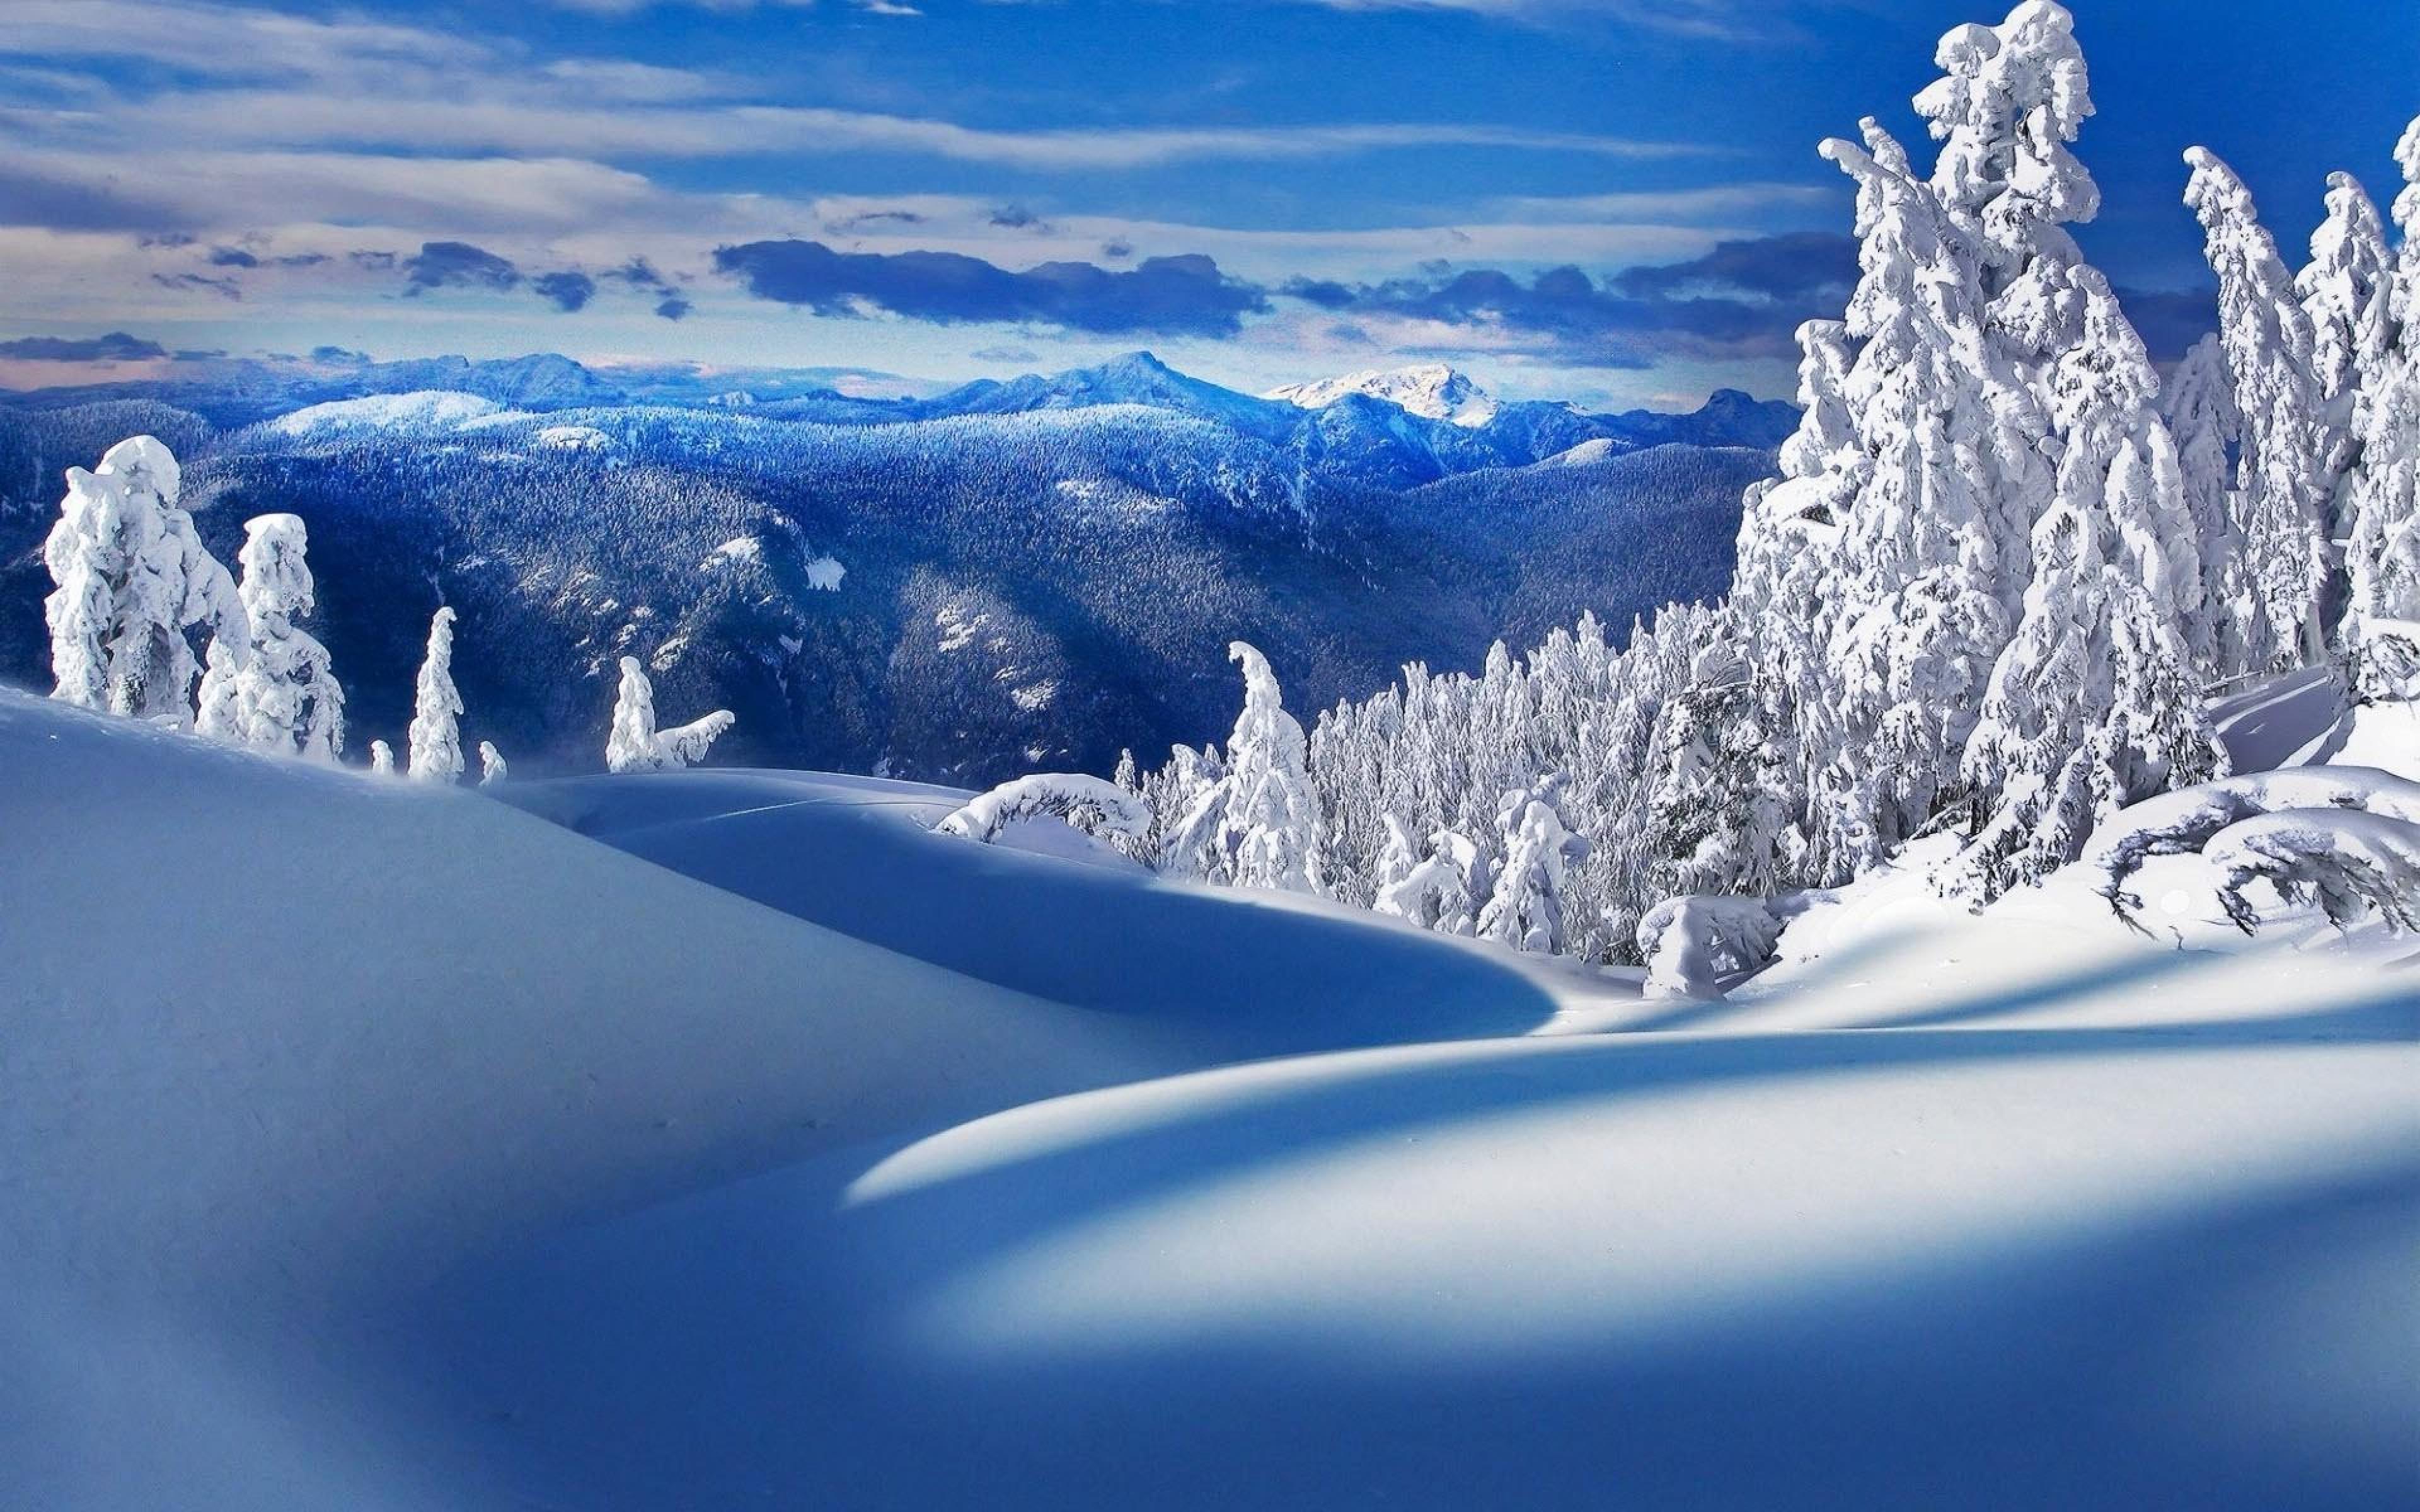 beautiful winter scenery wallpaper - sf wallpaper